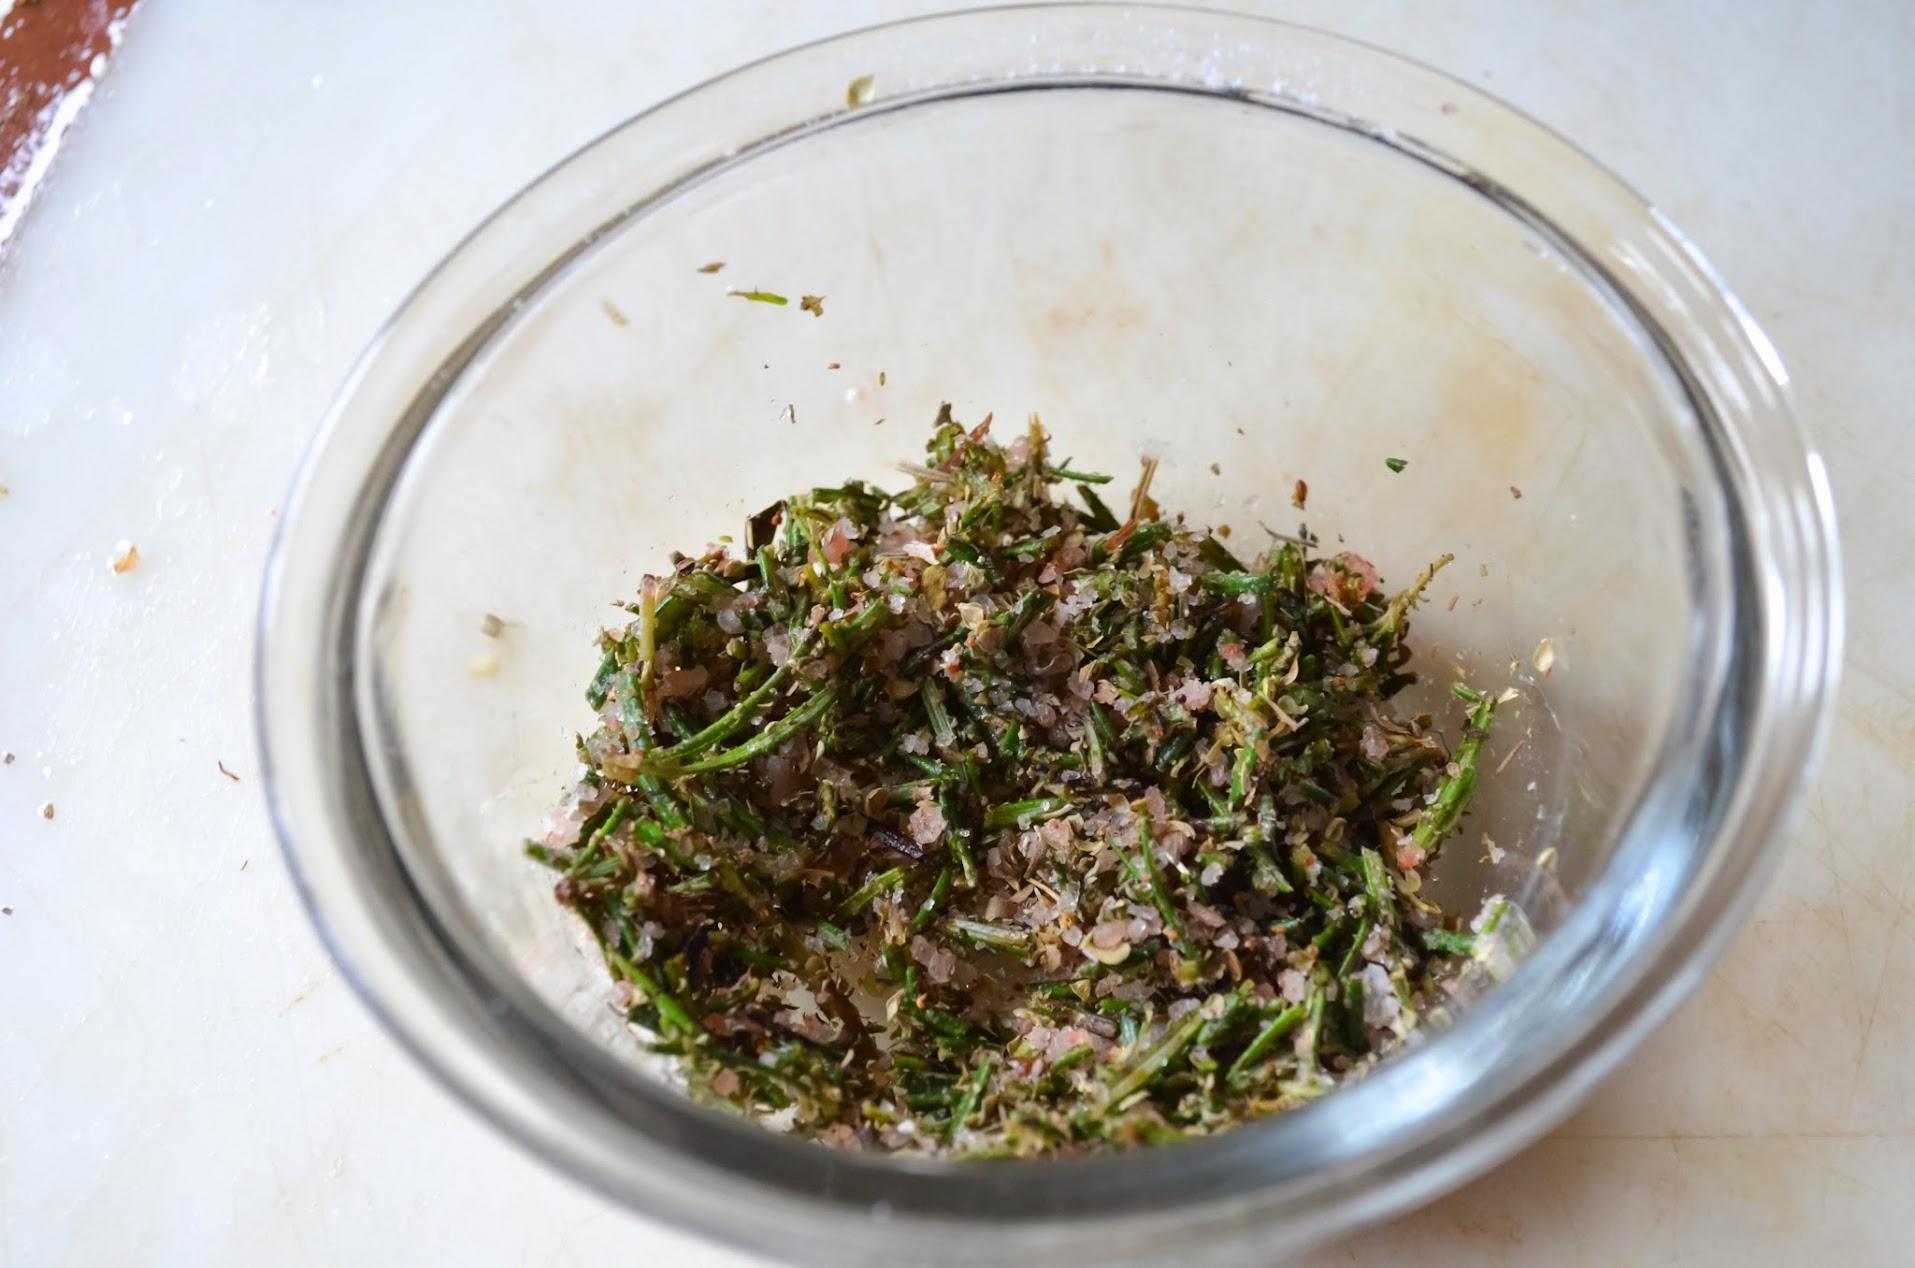 Herbed-Focaccia-Bread-Rosemary-Italian-Seasoning-Salt.jpg